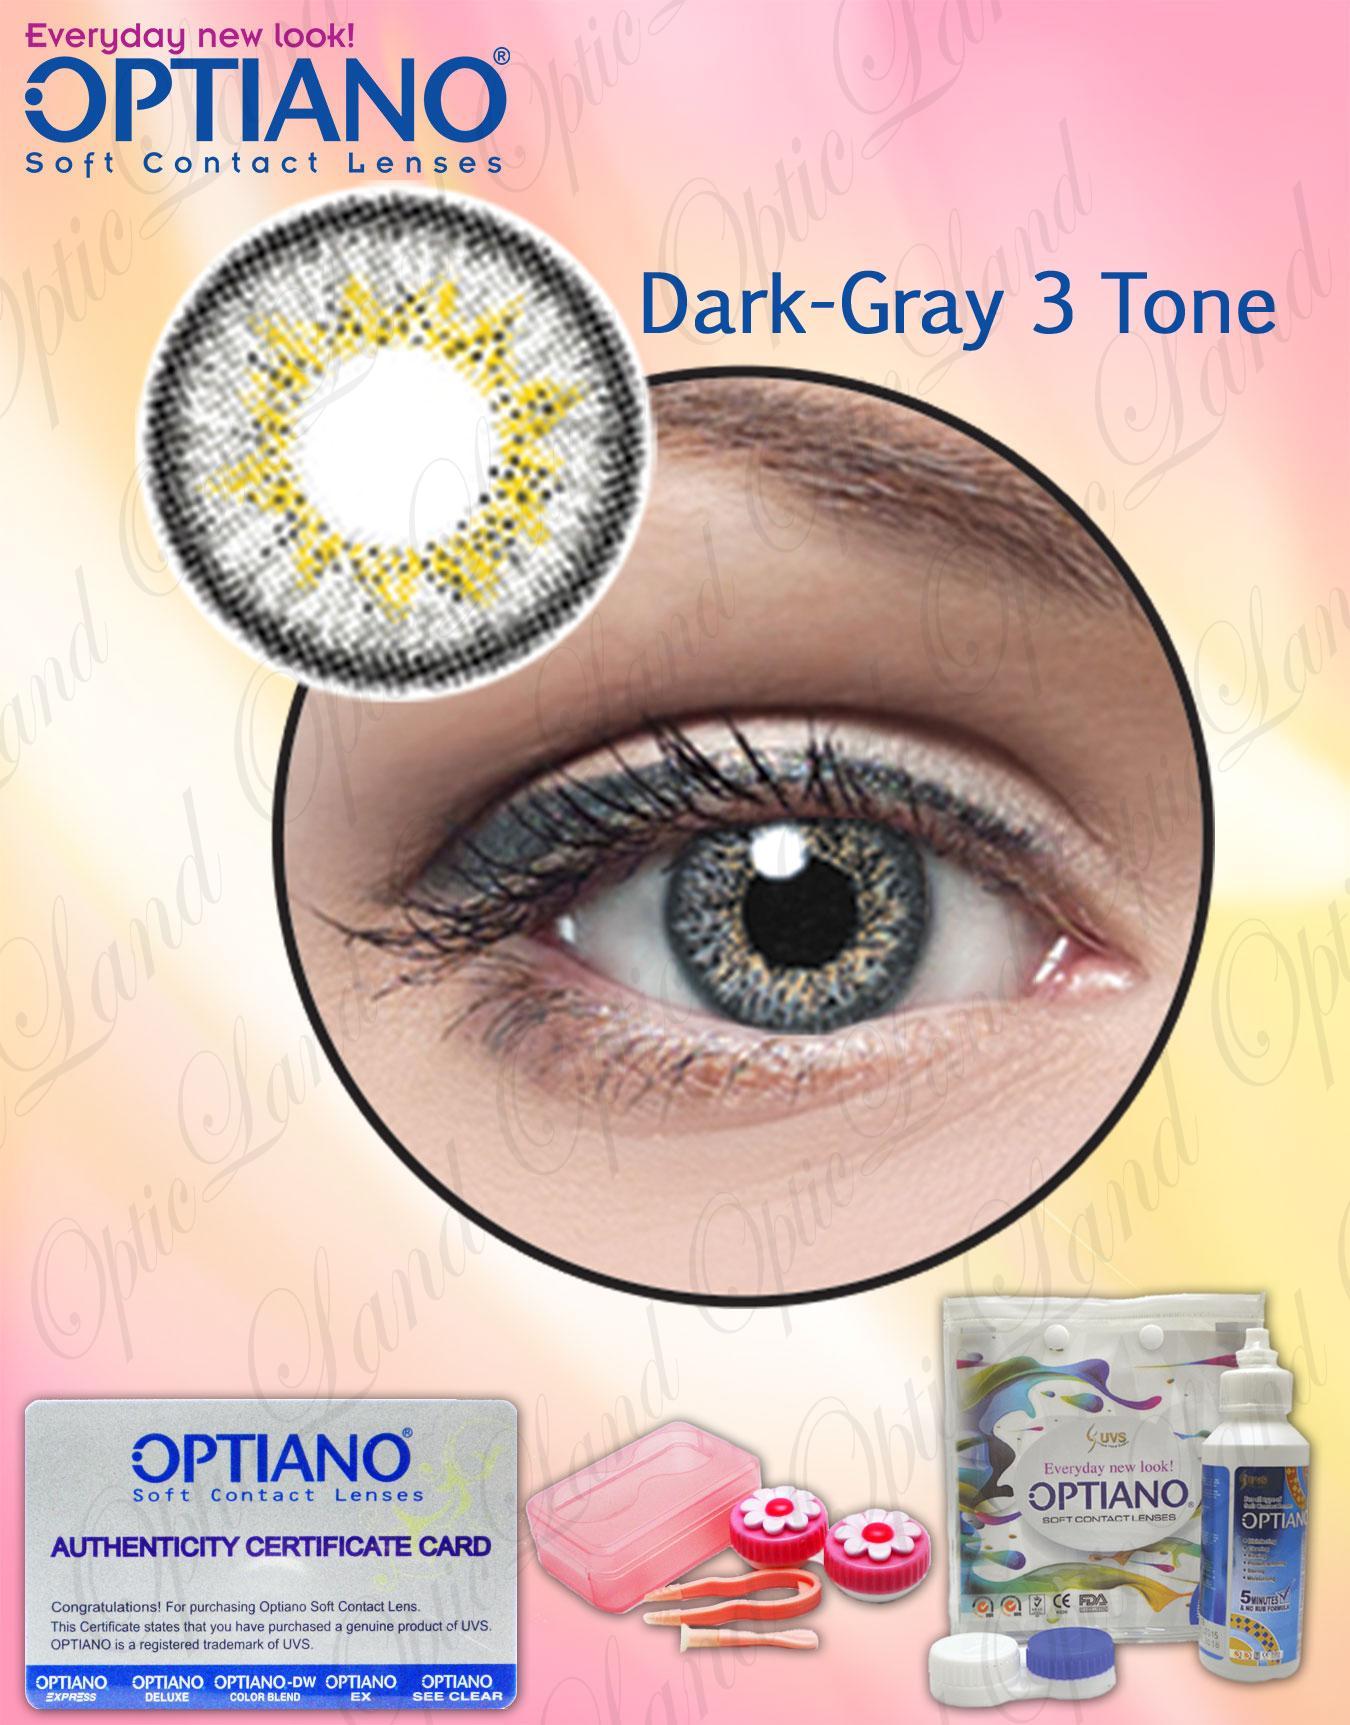 fe9fc09f89 Buy Optic Land Eyewear Glasses at Best Prices Online in Pakistan ...